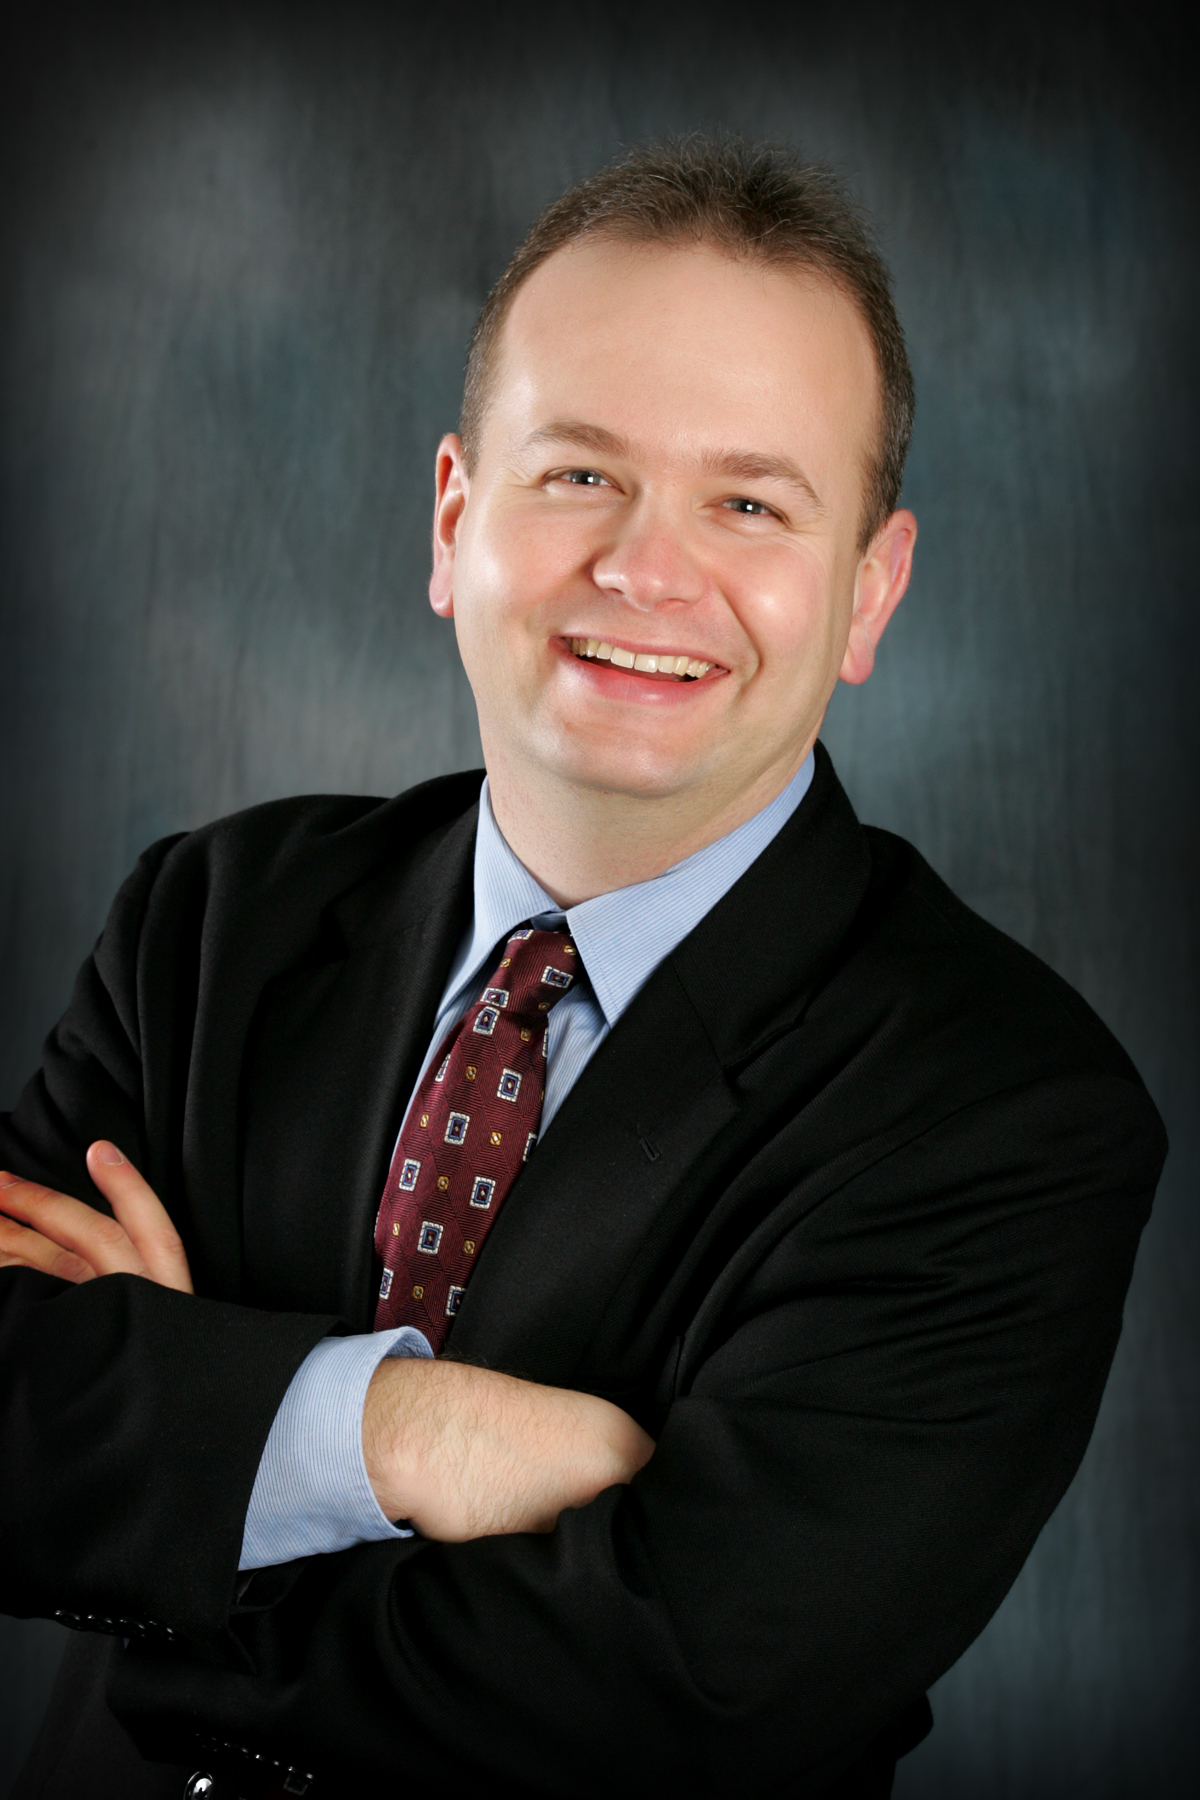 State Representative Andrew Brenner